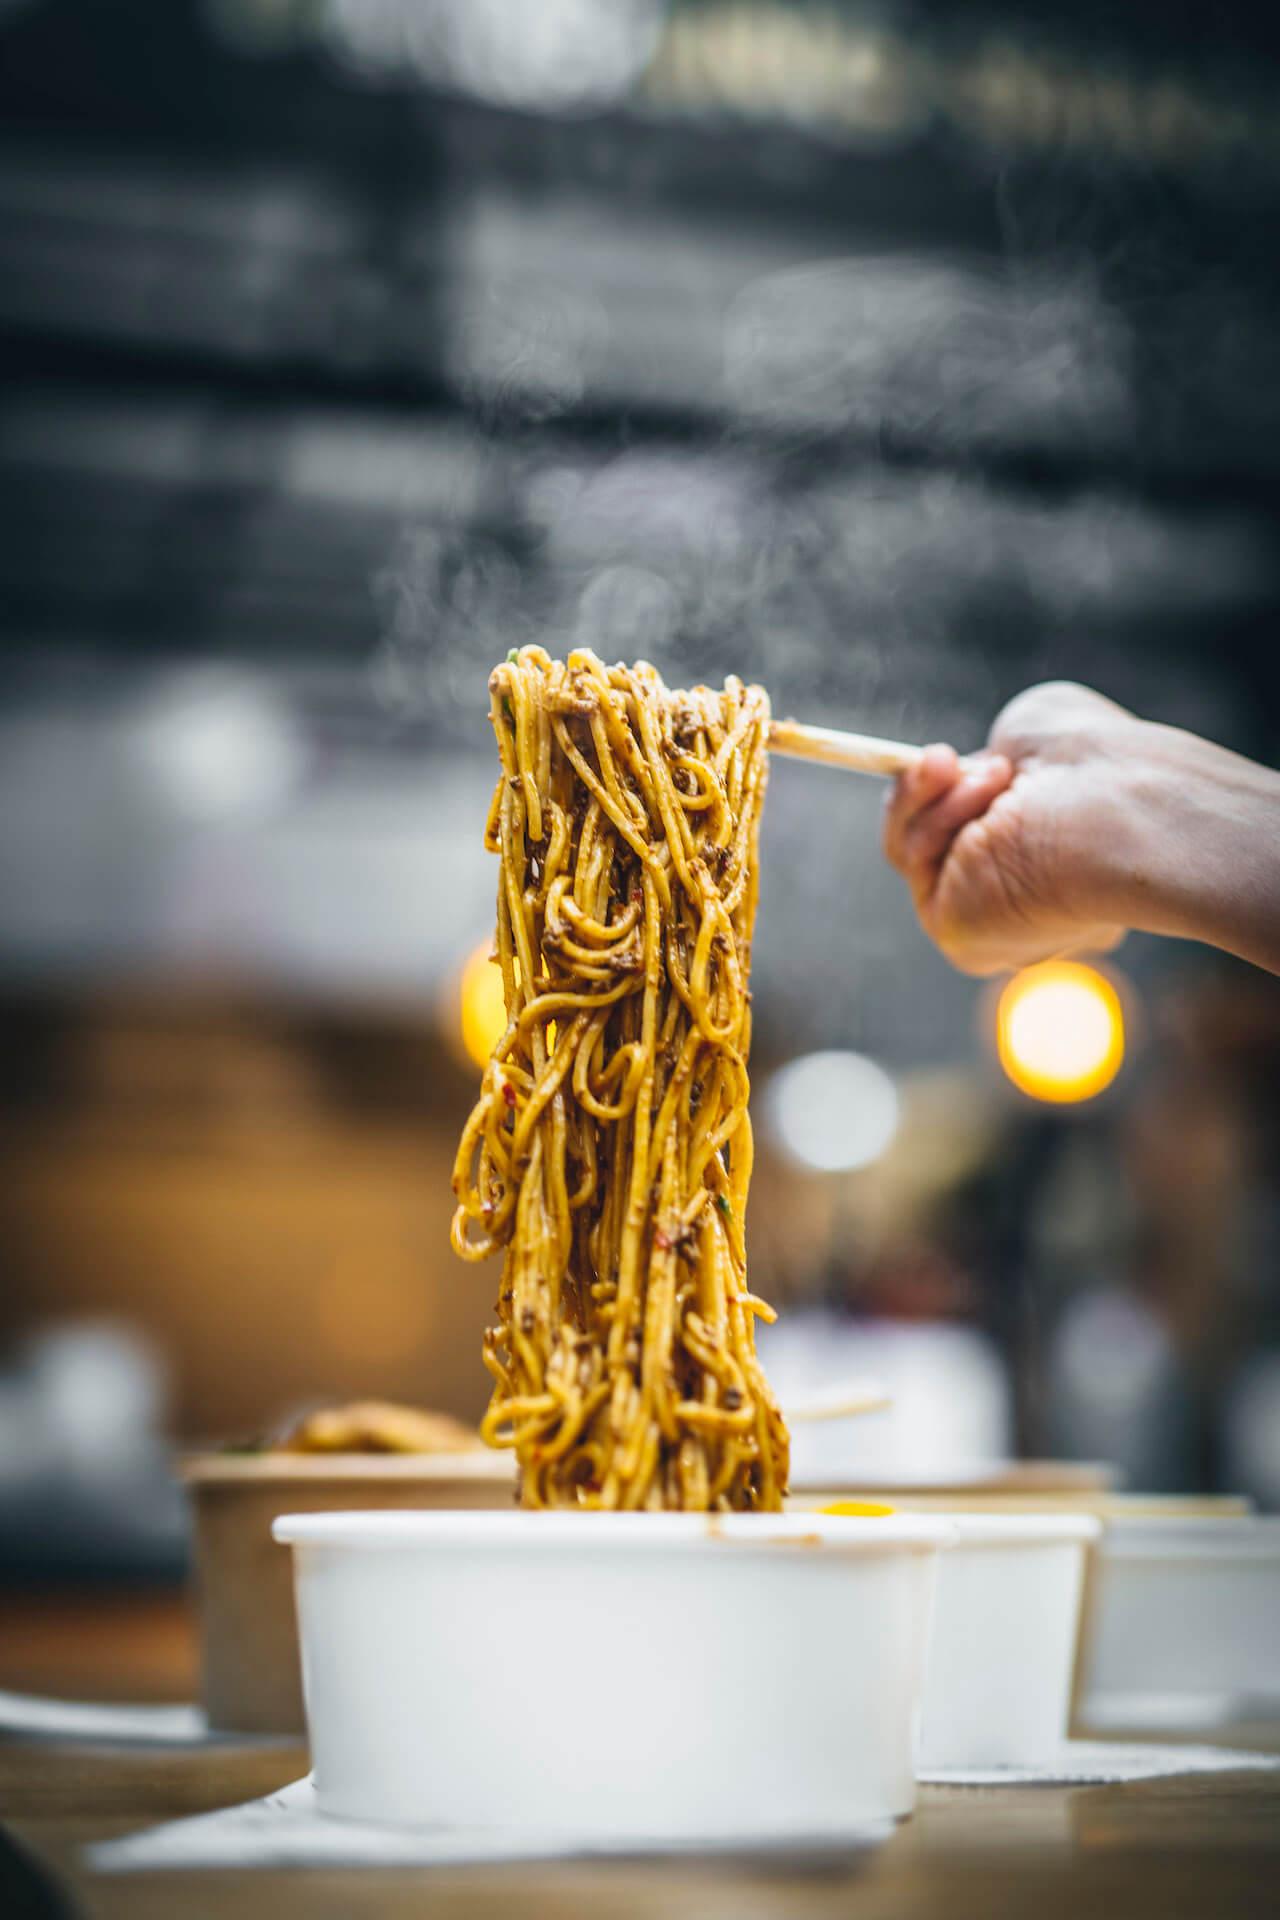 dan-dan-beef-noodles-dumpling-shack-london.jpg